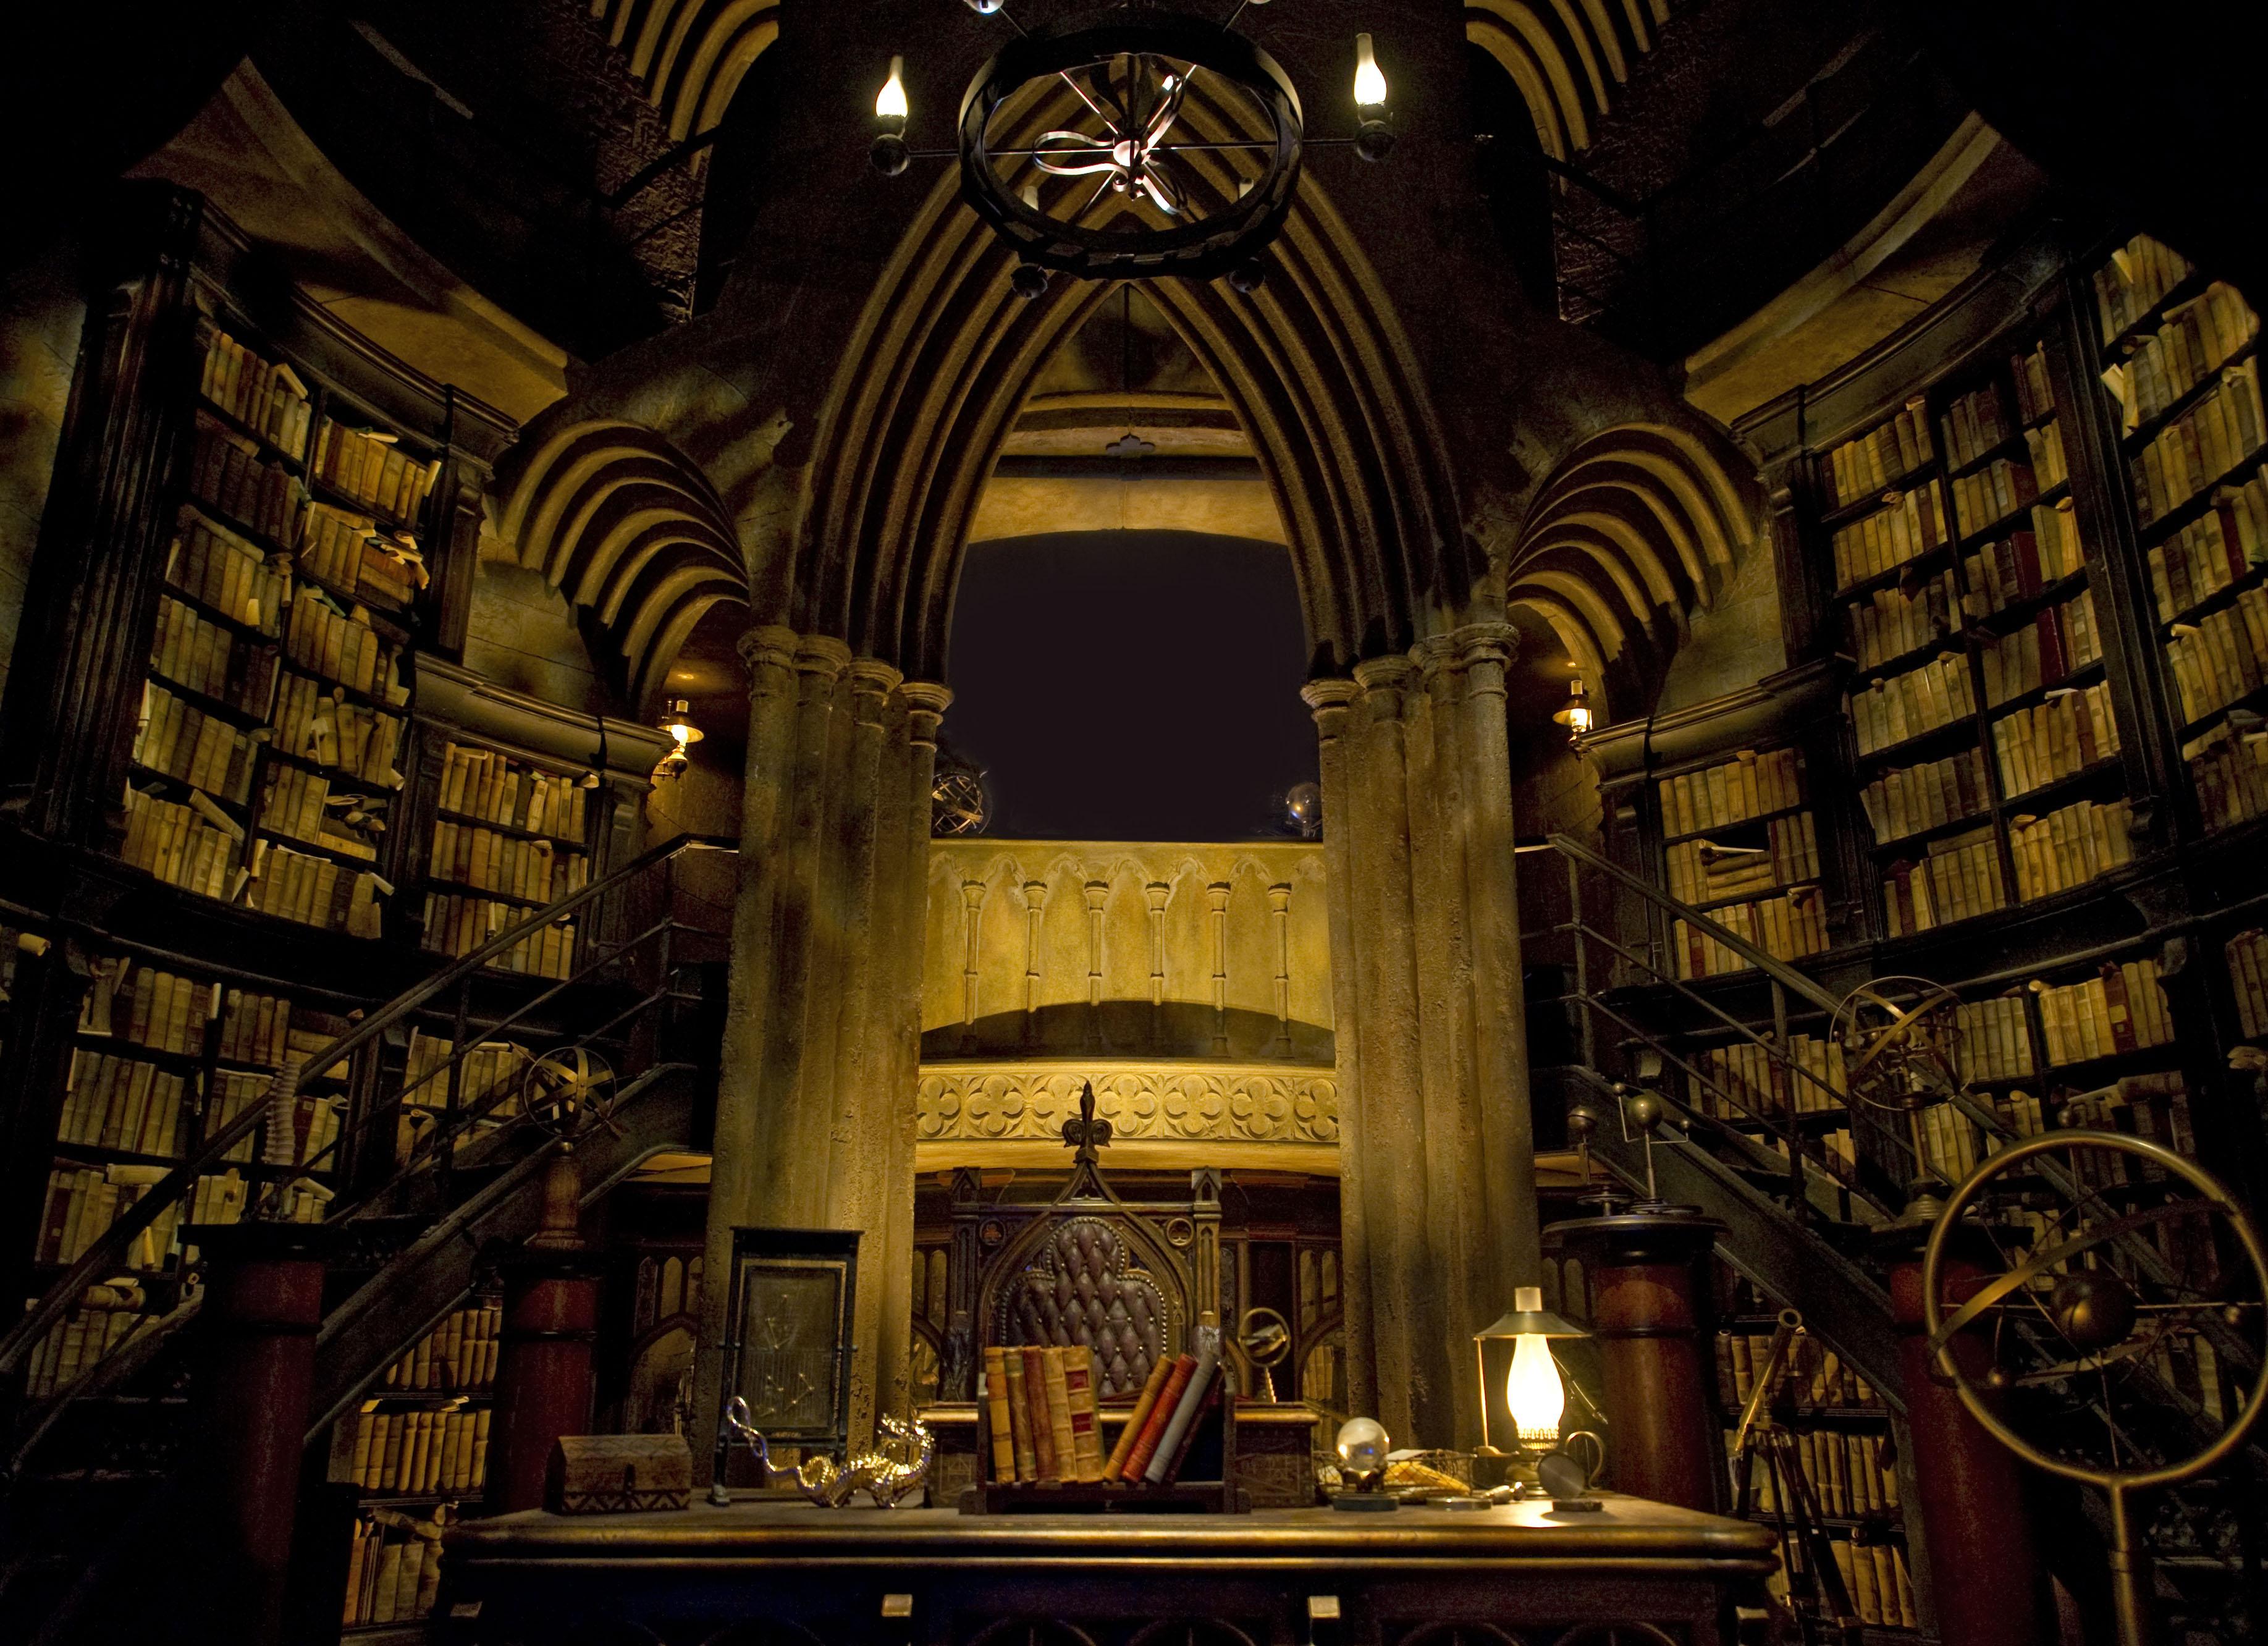 Dumbledores Office at Hogwarts Desktop Wallpaper 3671x2664